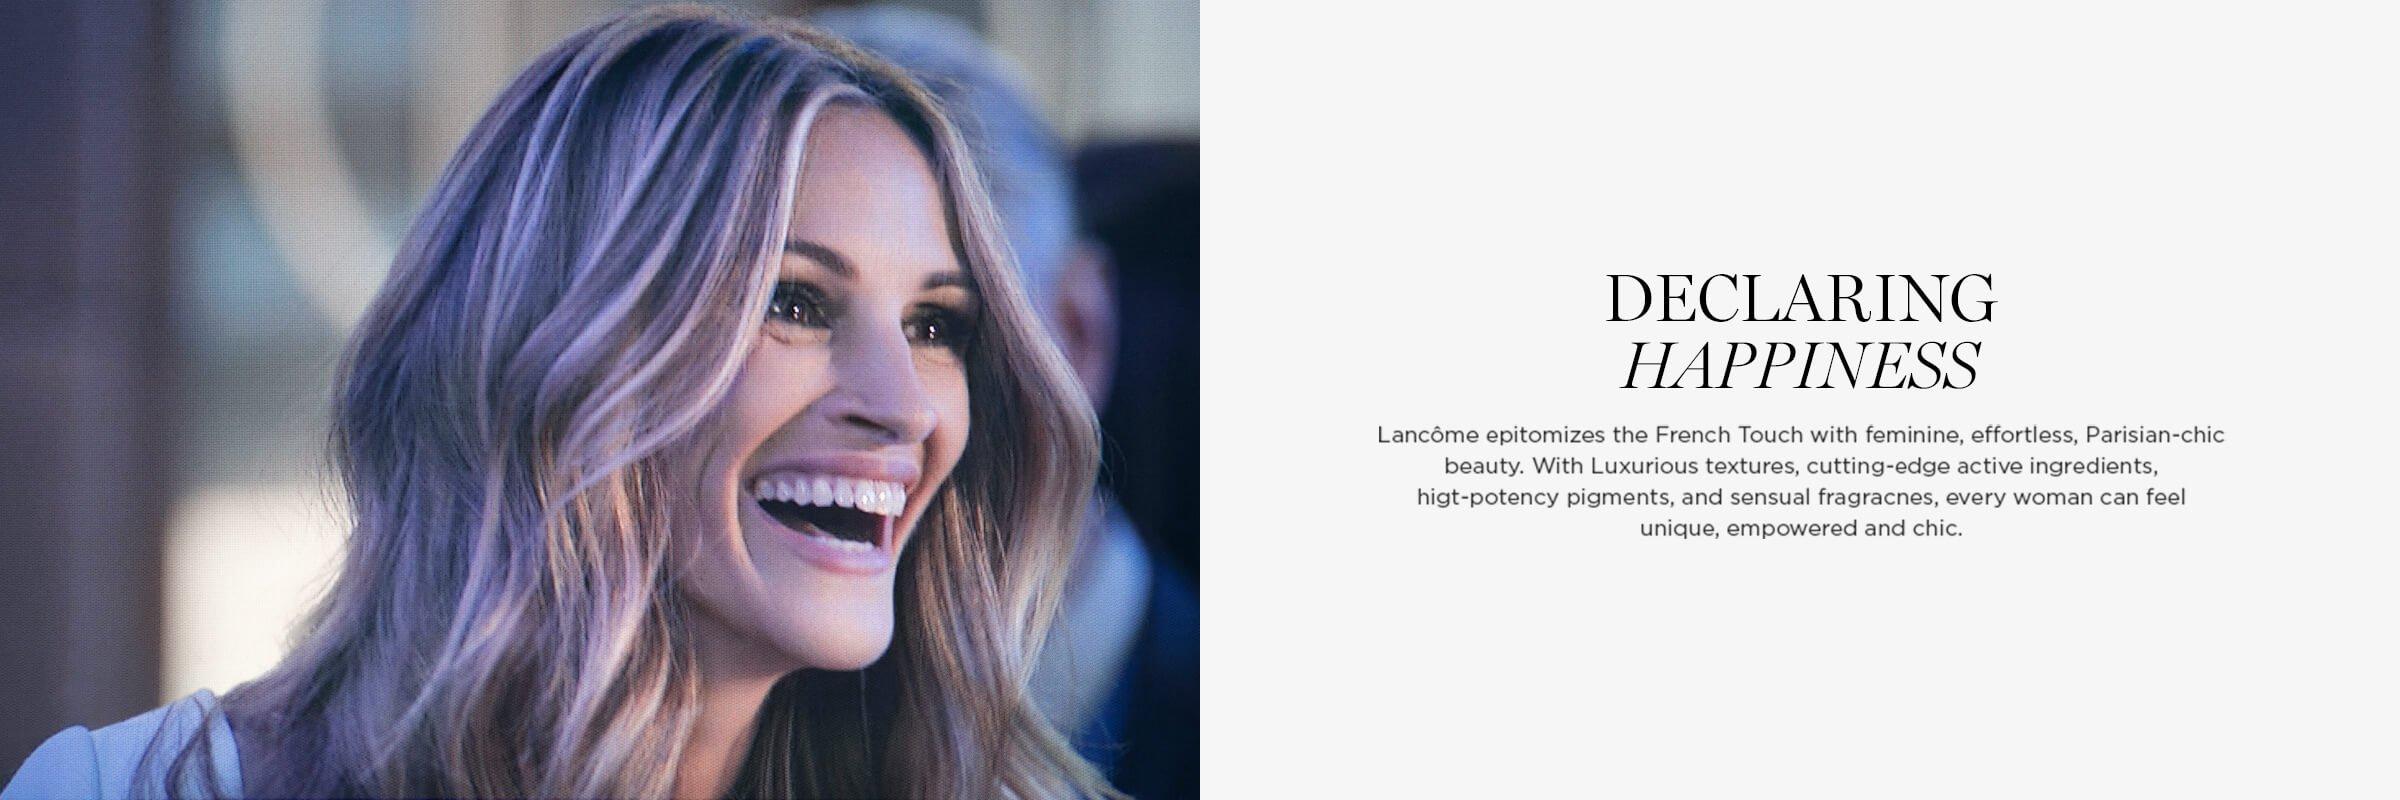 Lancome - Declaring Happiness